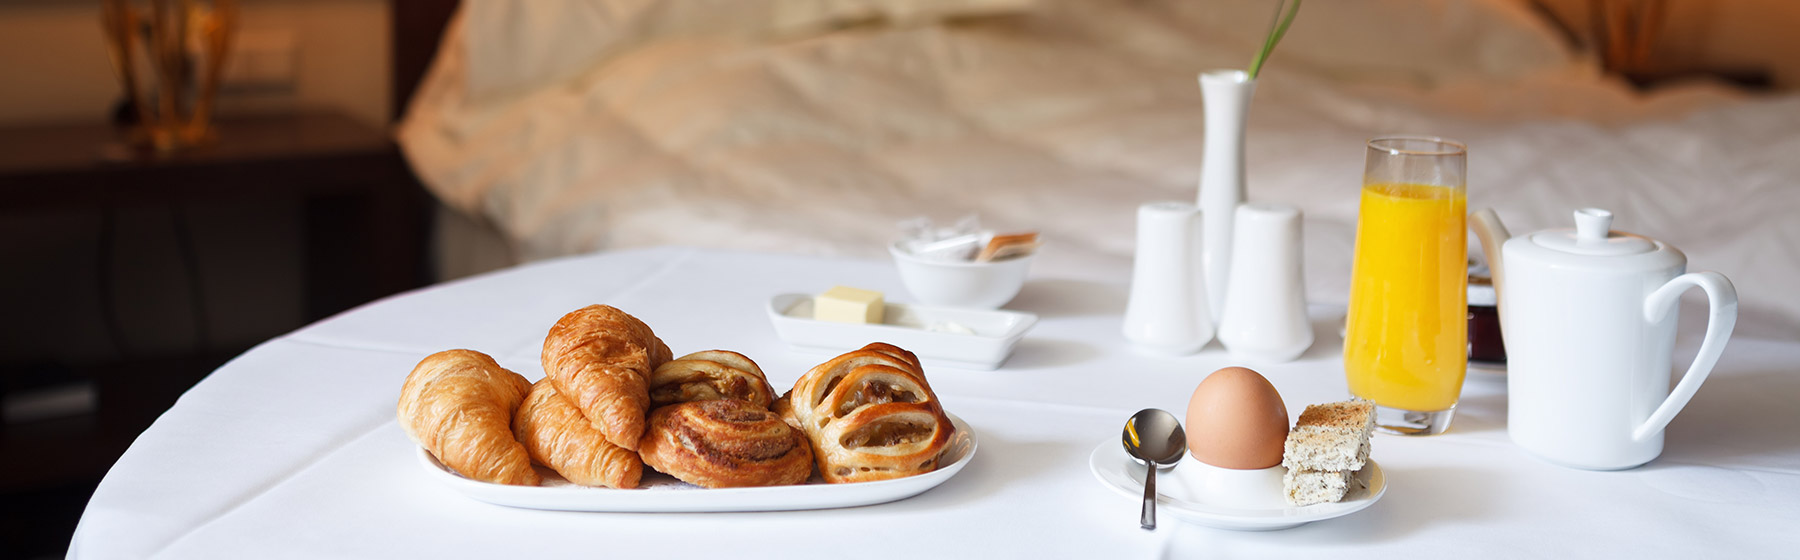 Breakfast Buffet for Two Pack at Ellis Hotel, Atlanta